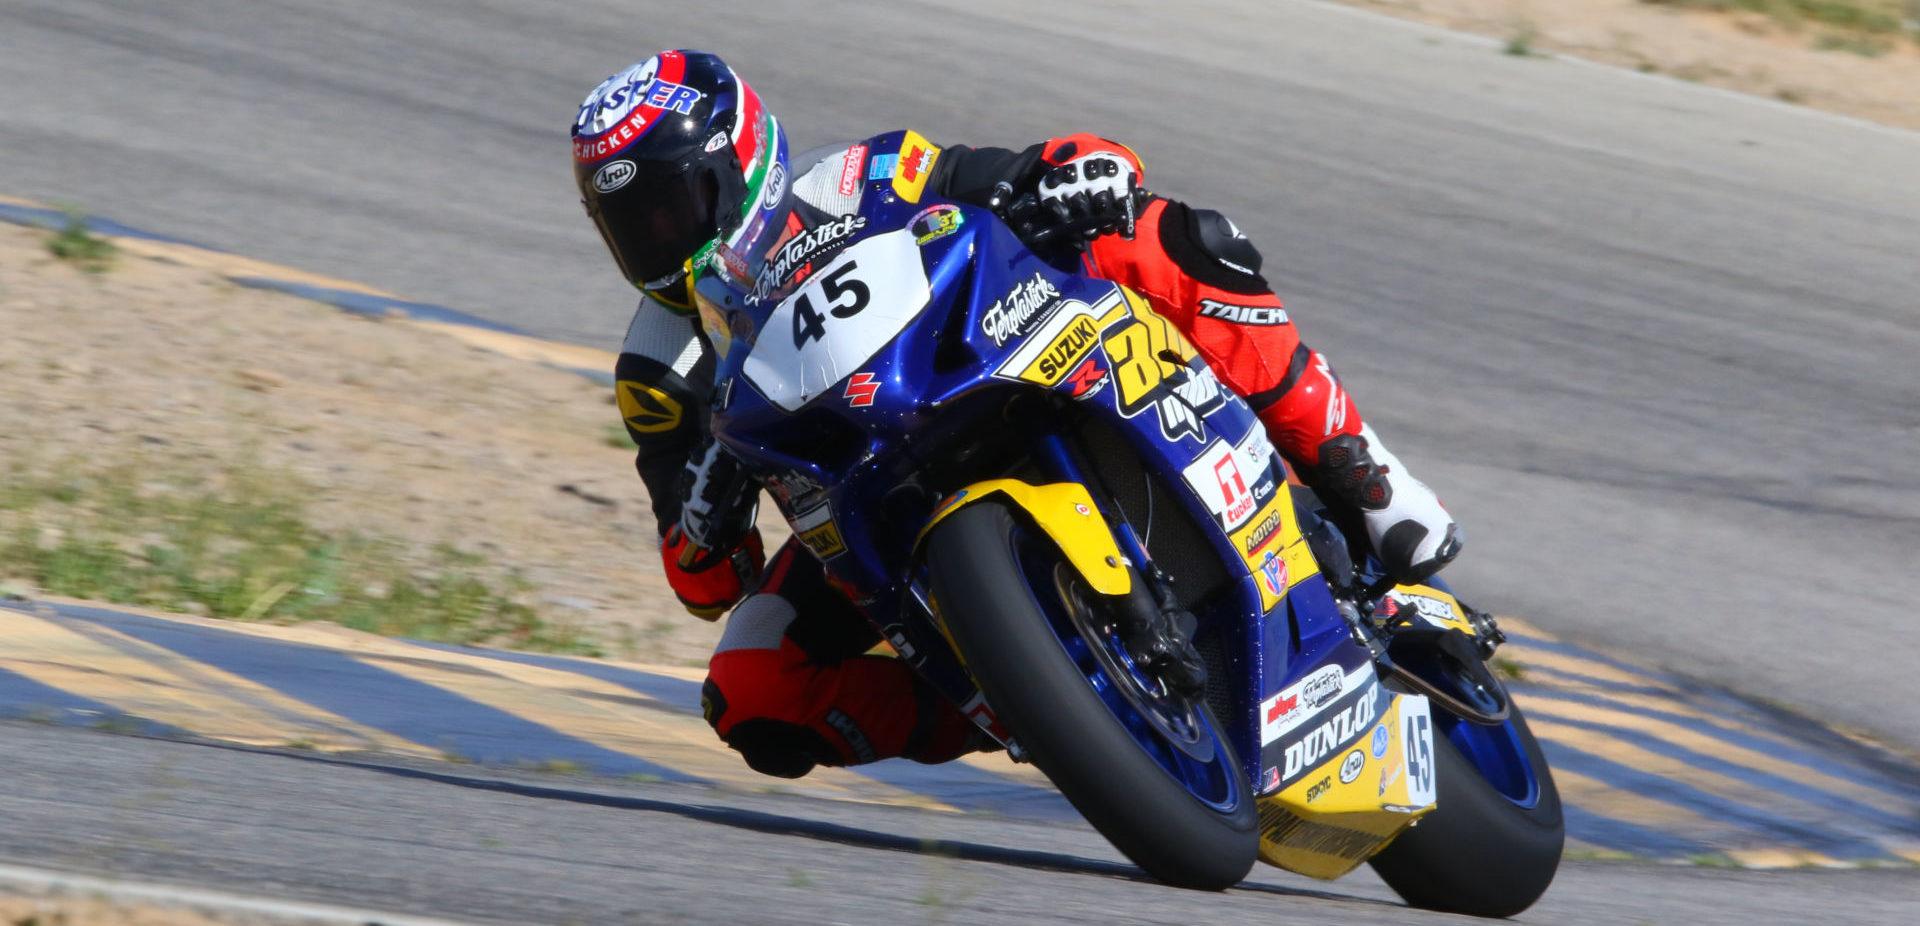 Motoamerica Petersen Racing Superbike And Stock 1000 For Altus Motorsports Roadracing World Magazine Motorcycle Riding Racing Tech News